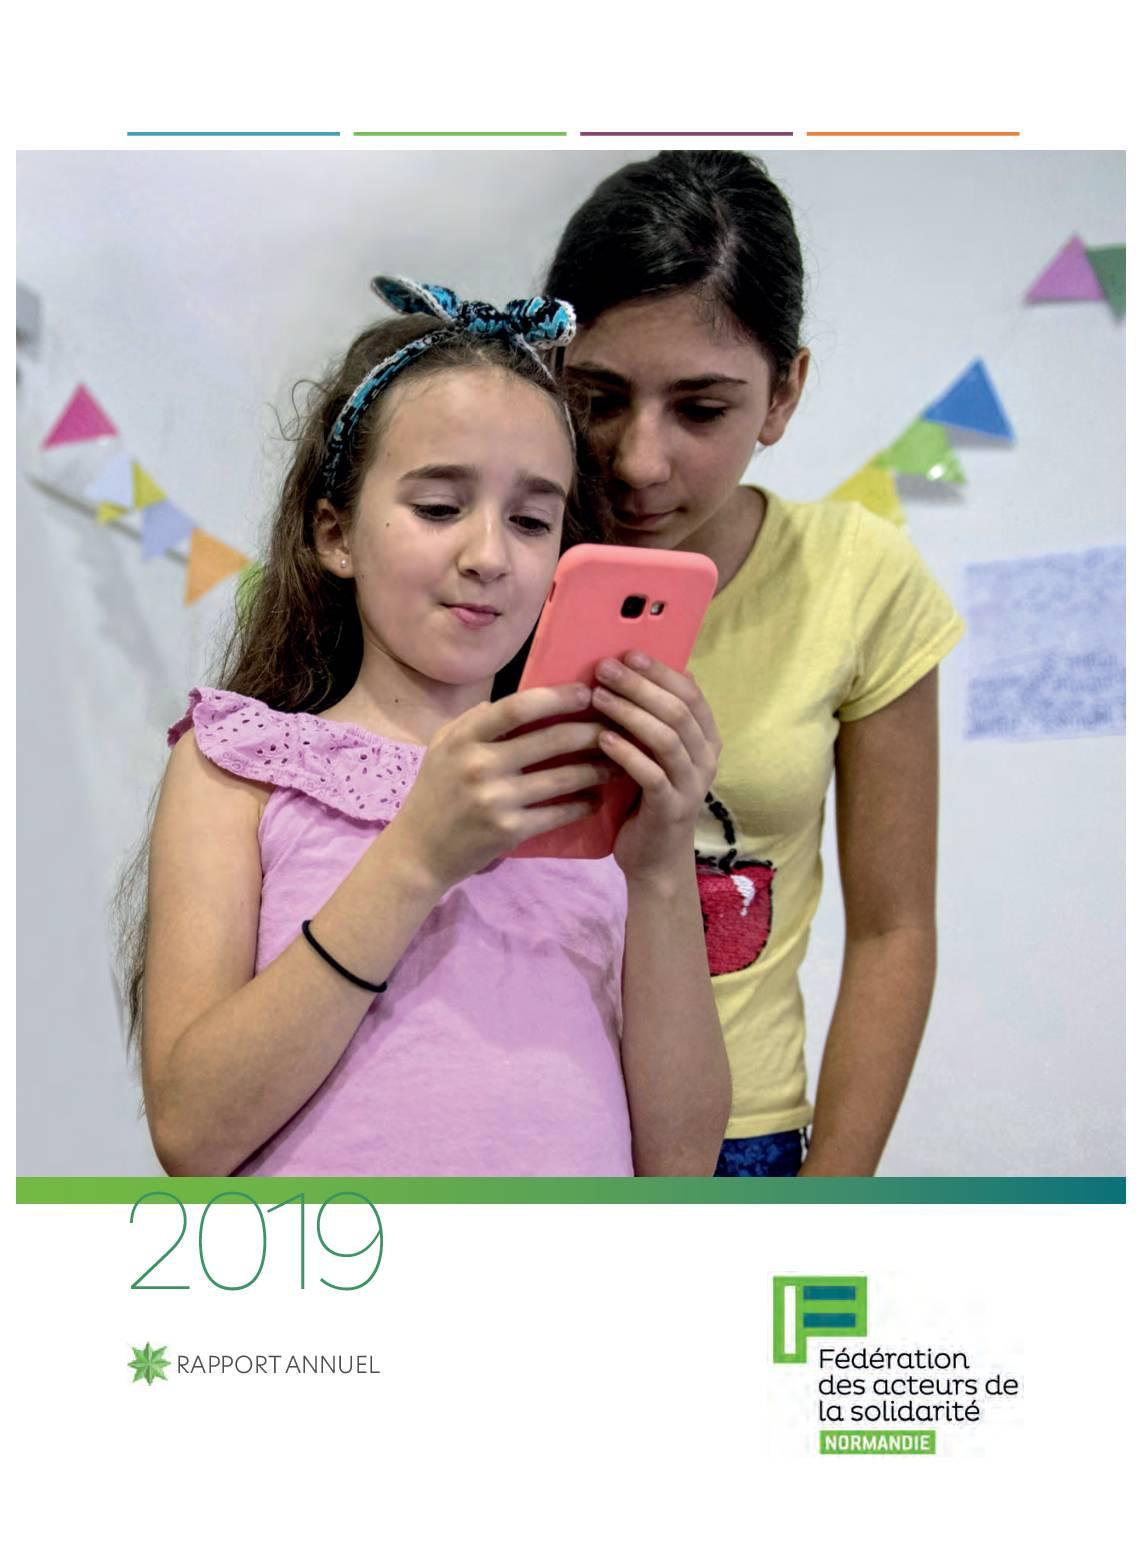 Rapport annuel 2019 Normandie